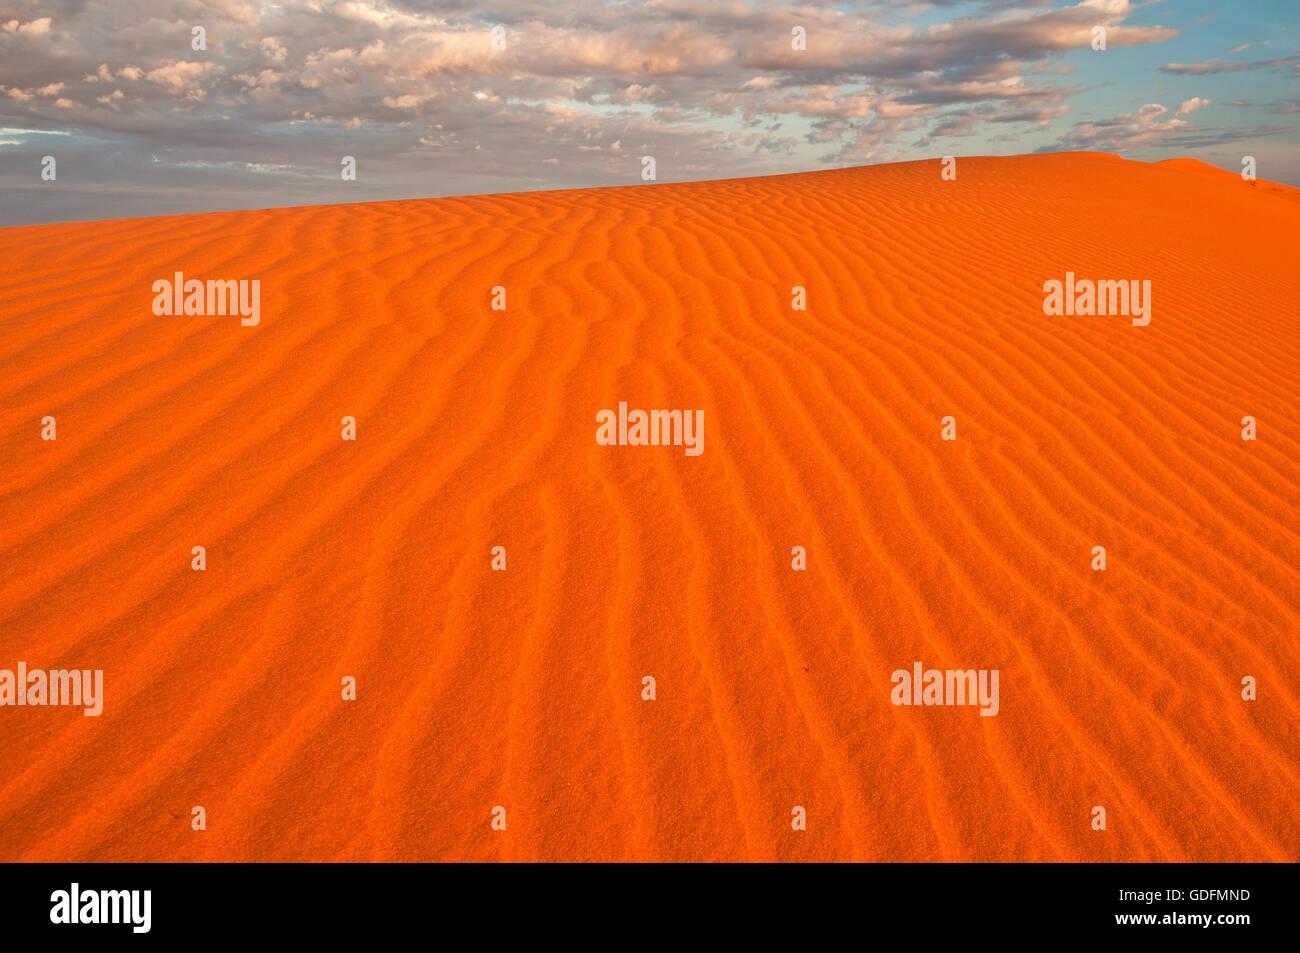 Red dune of Simpson desert glowing in sunrise. - Stock Image